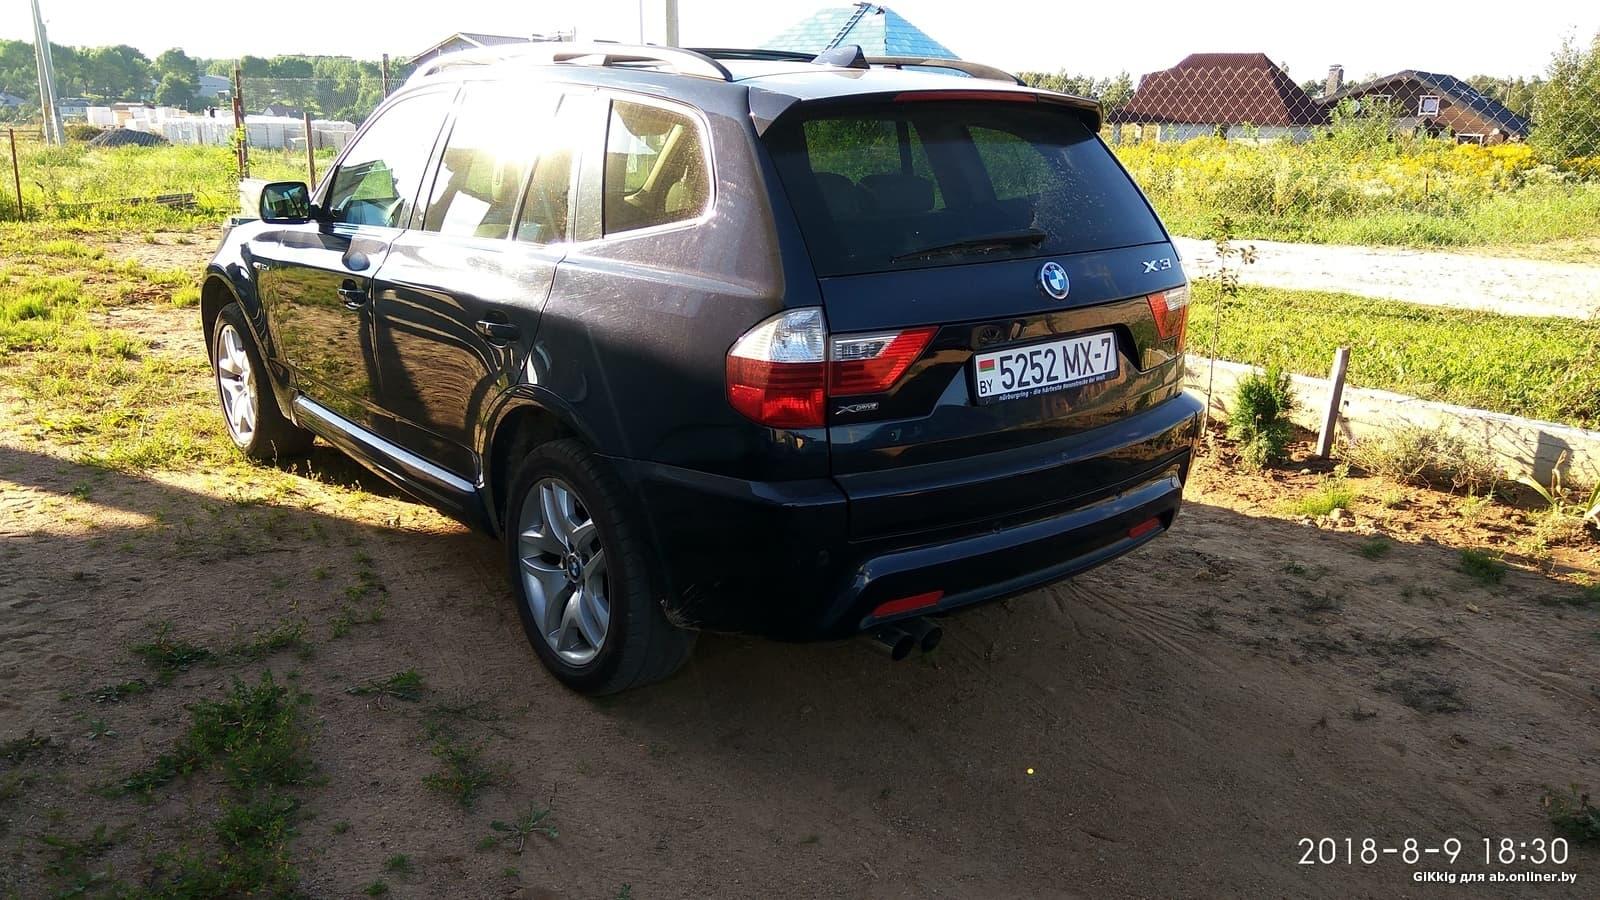 BMW X3 si rest